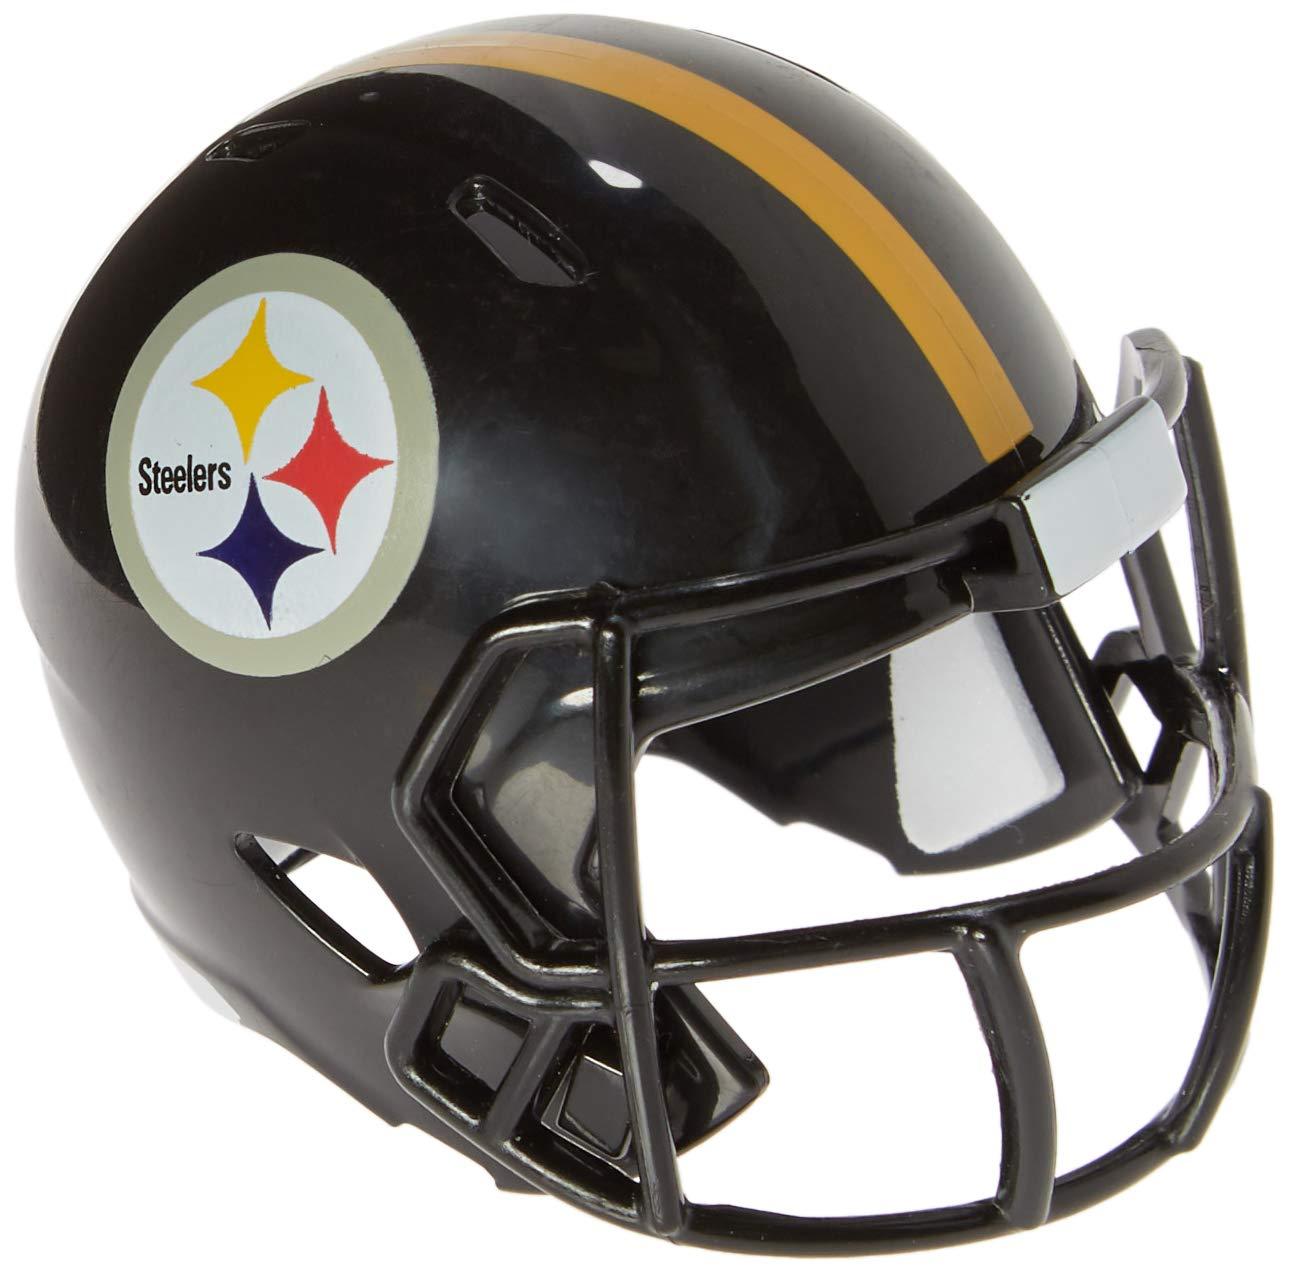 Riddell Mini-American-Football-Helm, NFL-Team: Pittsburg Steelers, im Taschenformat, Speed Pocket 095855320717